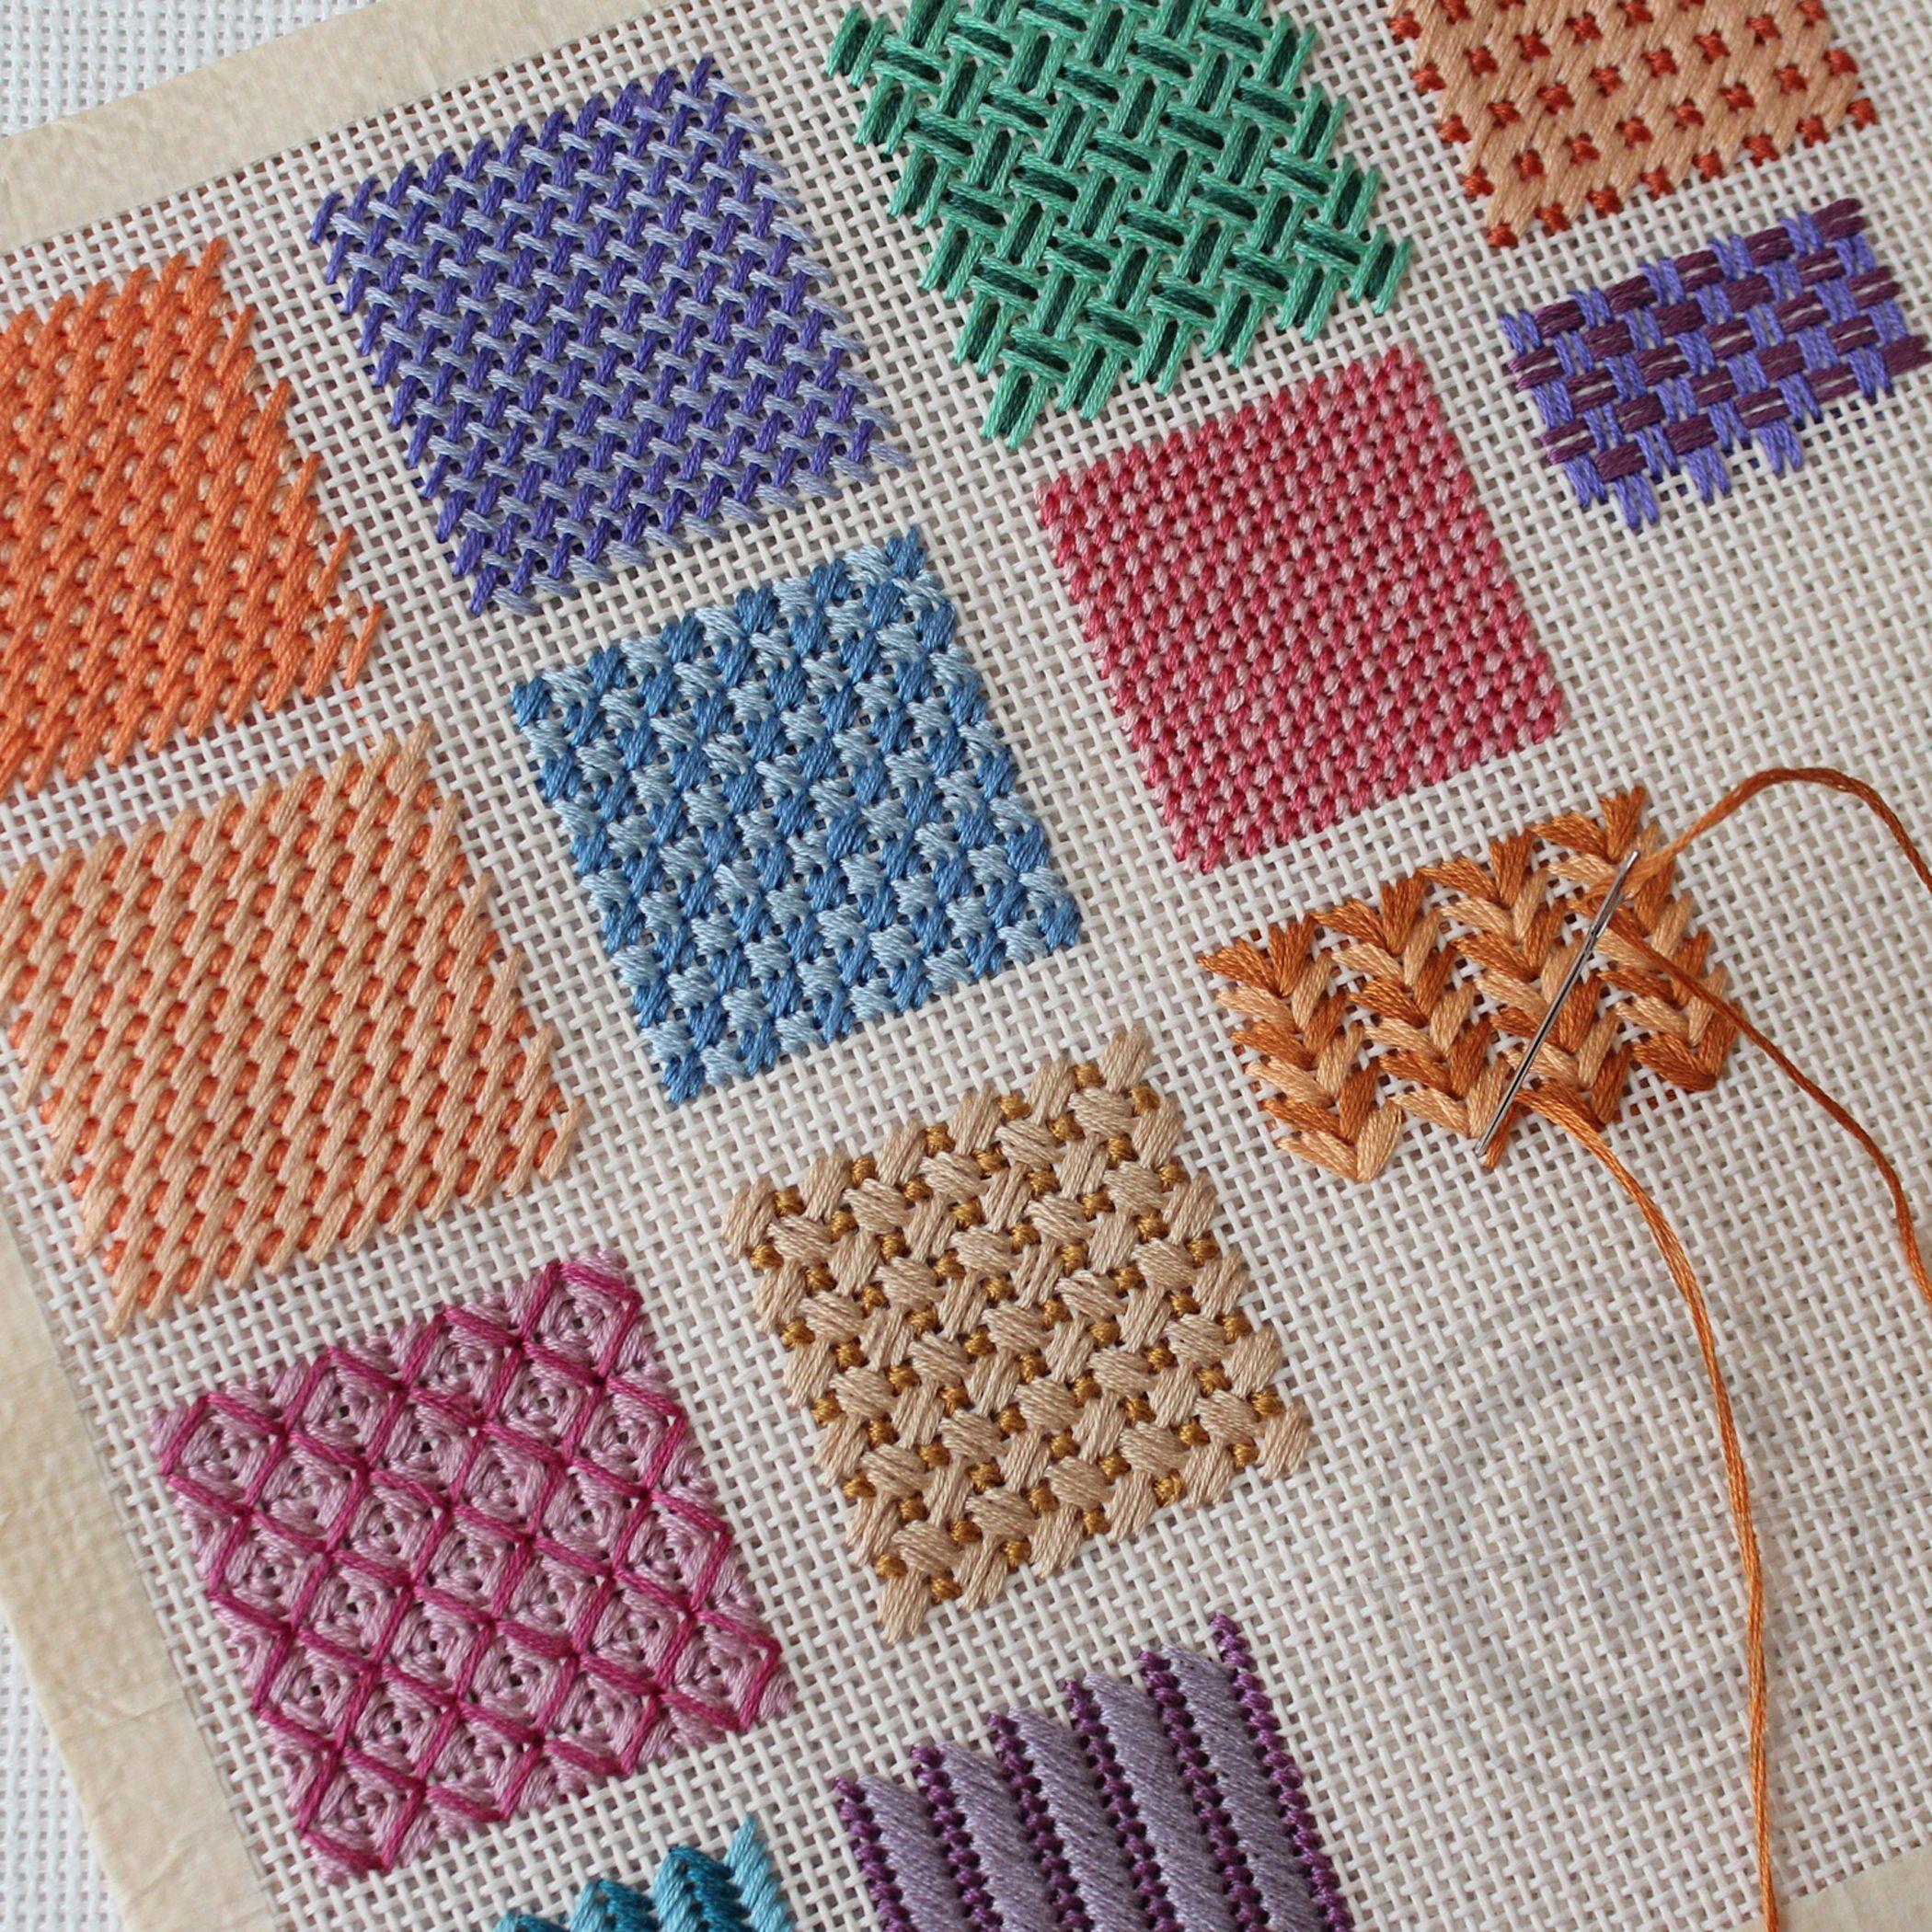 needlepoint stitches stitch diagrams photosynthesis diagram to label variations needleknowledge